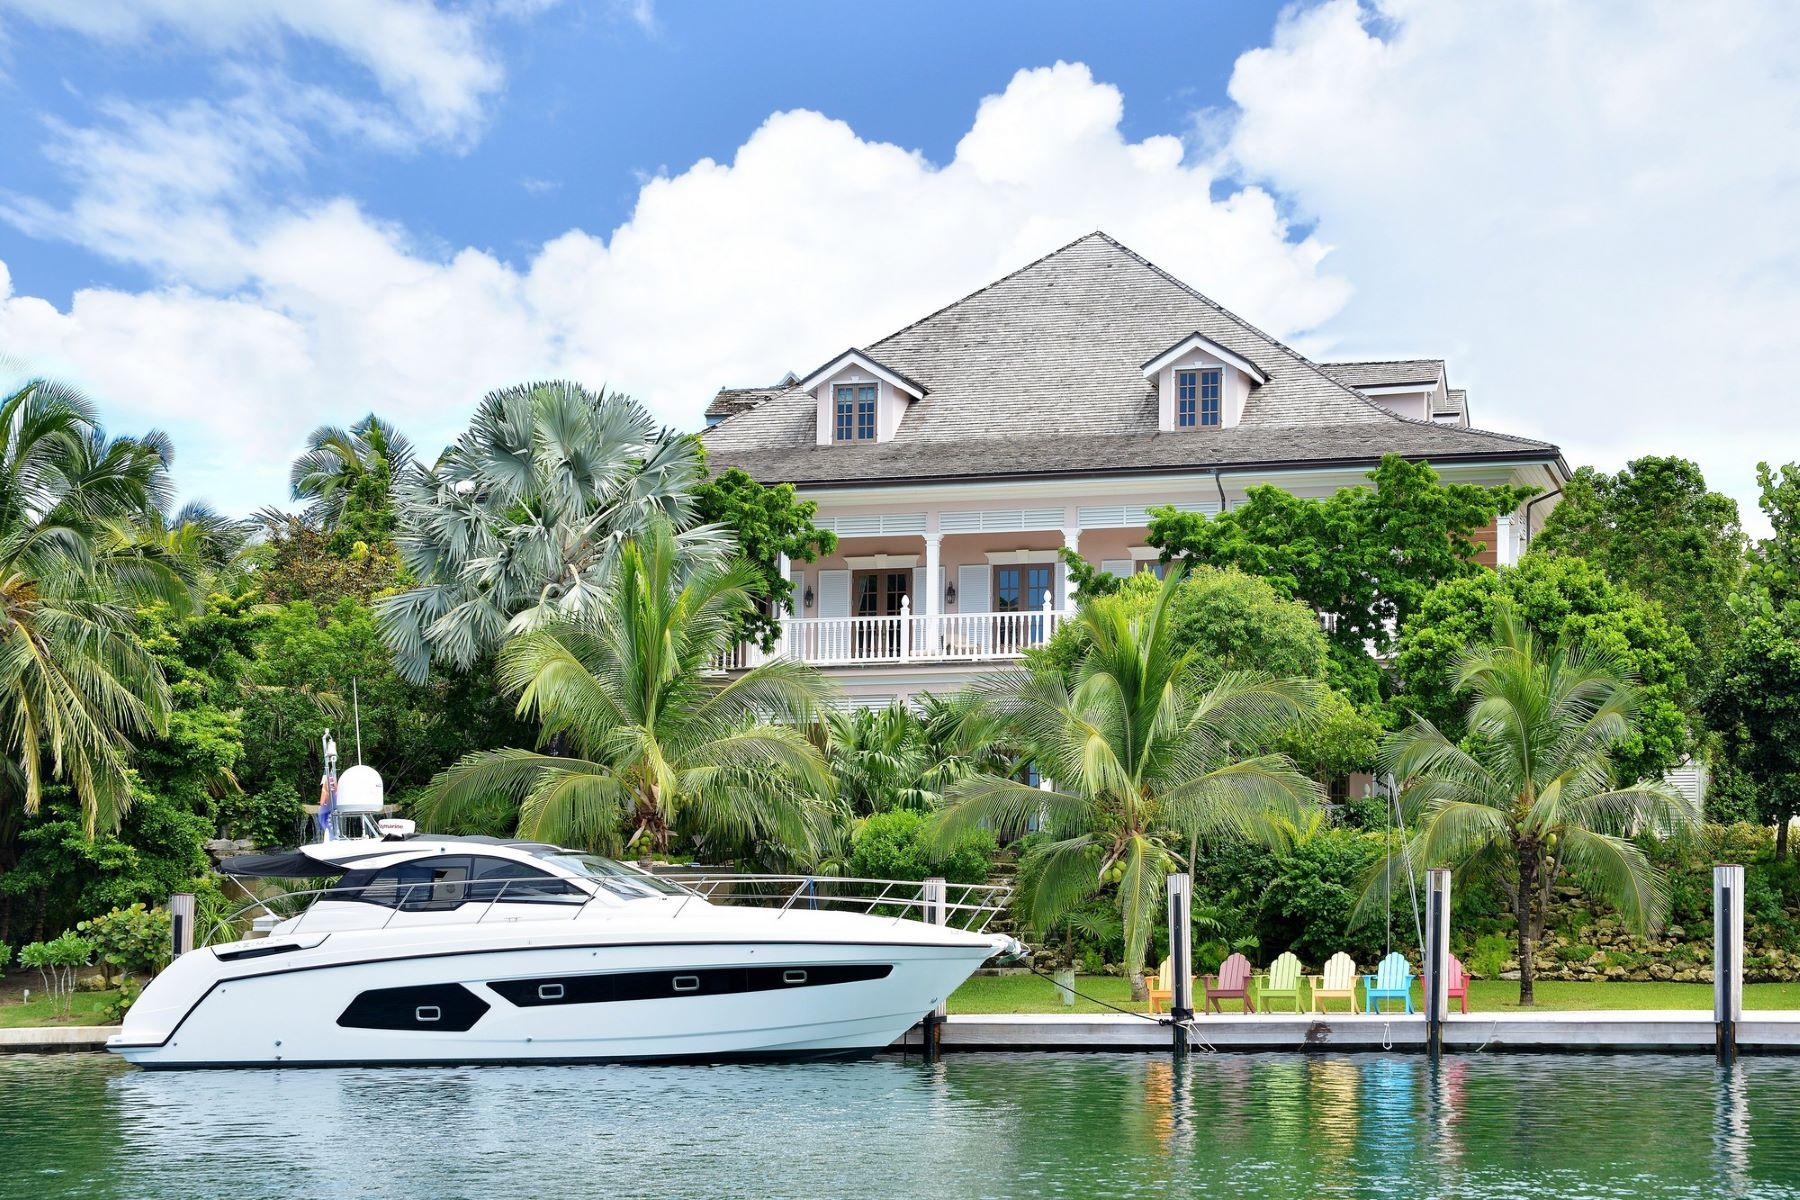 Single Family Home for Sale at Deja Vu Deja Vu Shamrock Road Lyford Cay, Nassau And Paradise Island . Bahamas